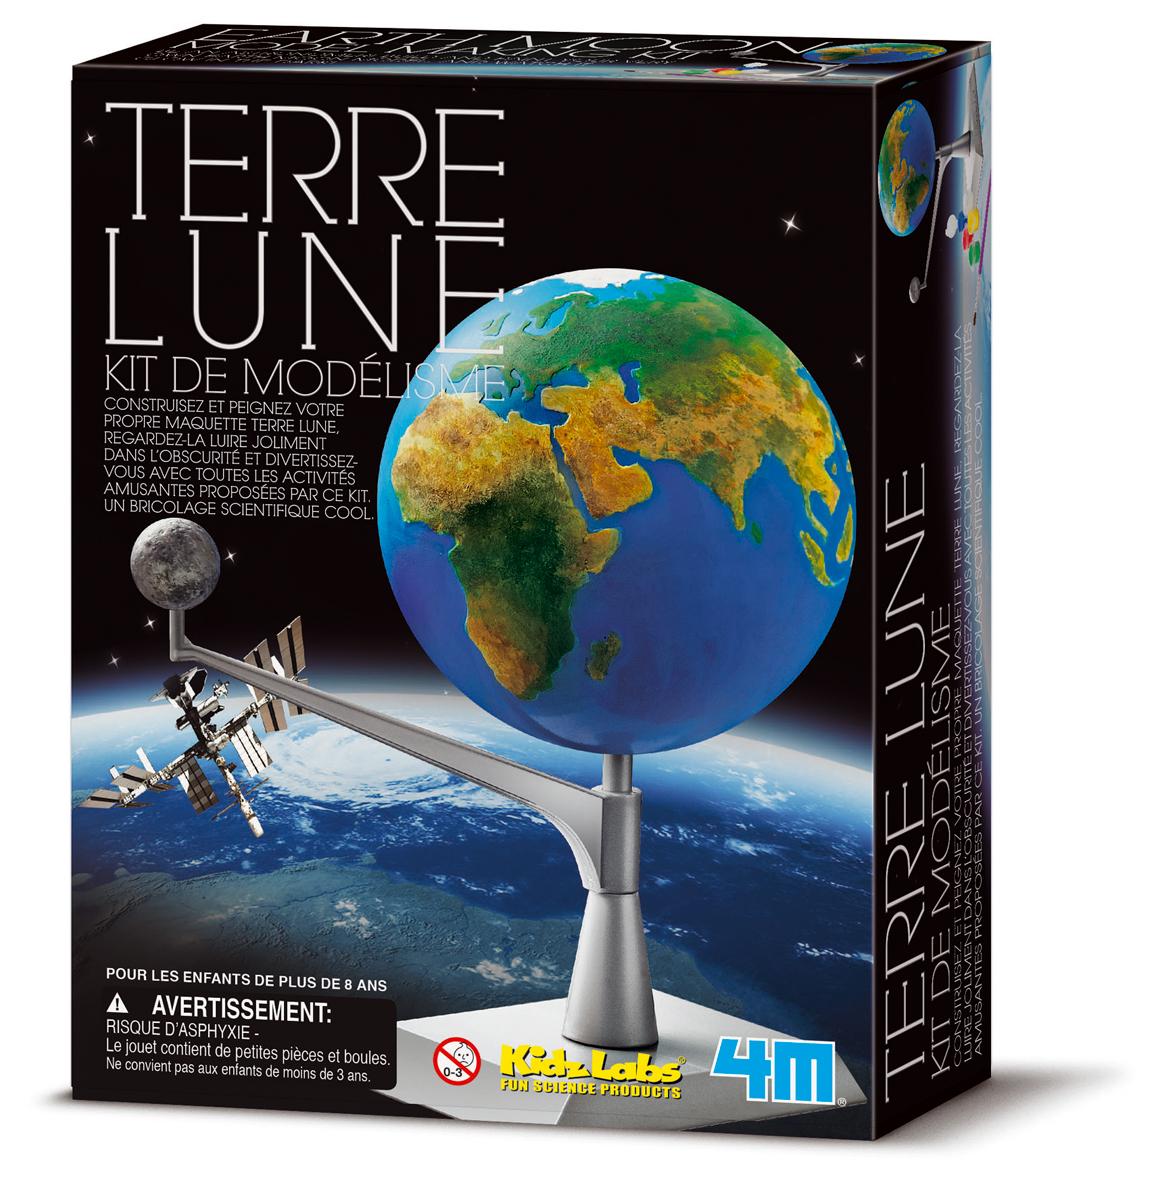 Kit de modélisme terre-lune - jeu scientifique Kidzlab